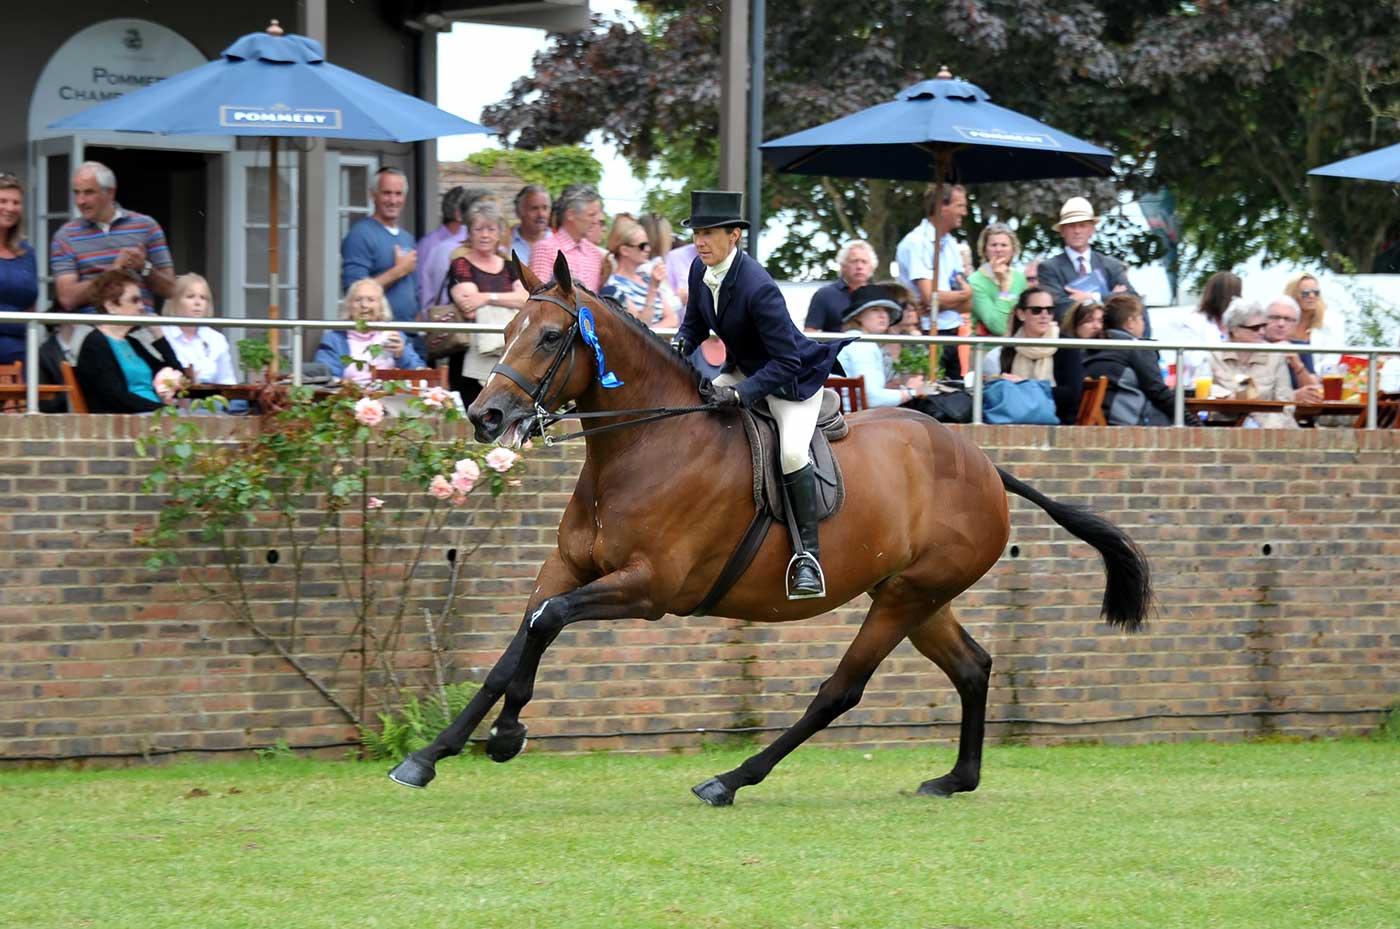 Planx Equestrian Photography - hi50606